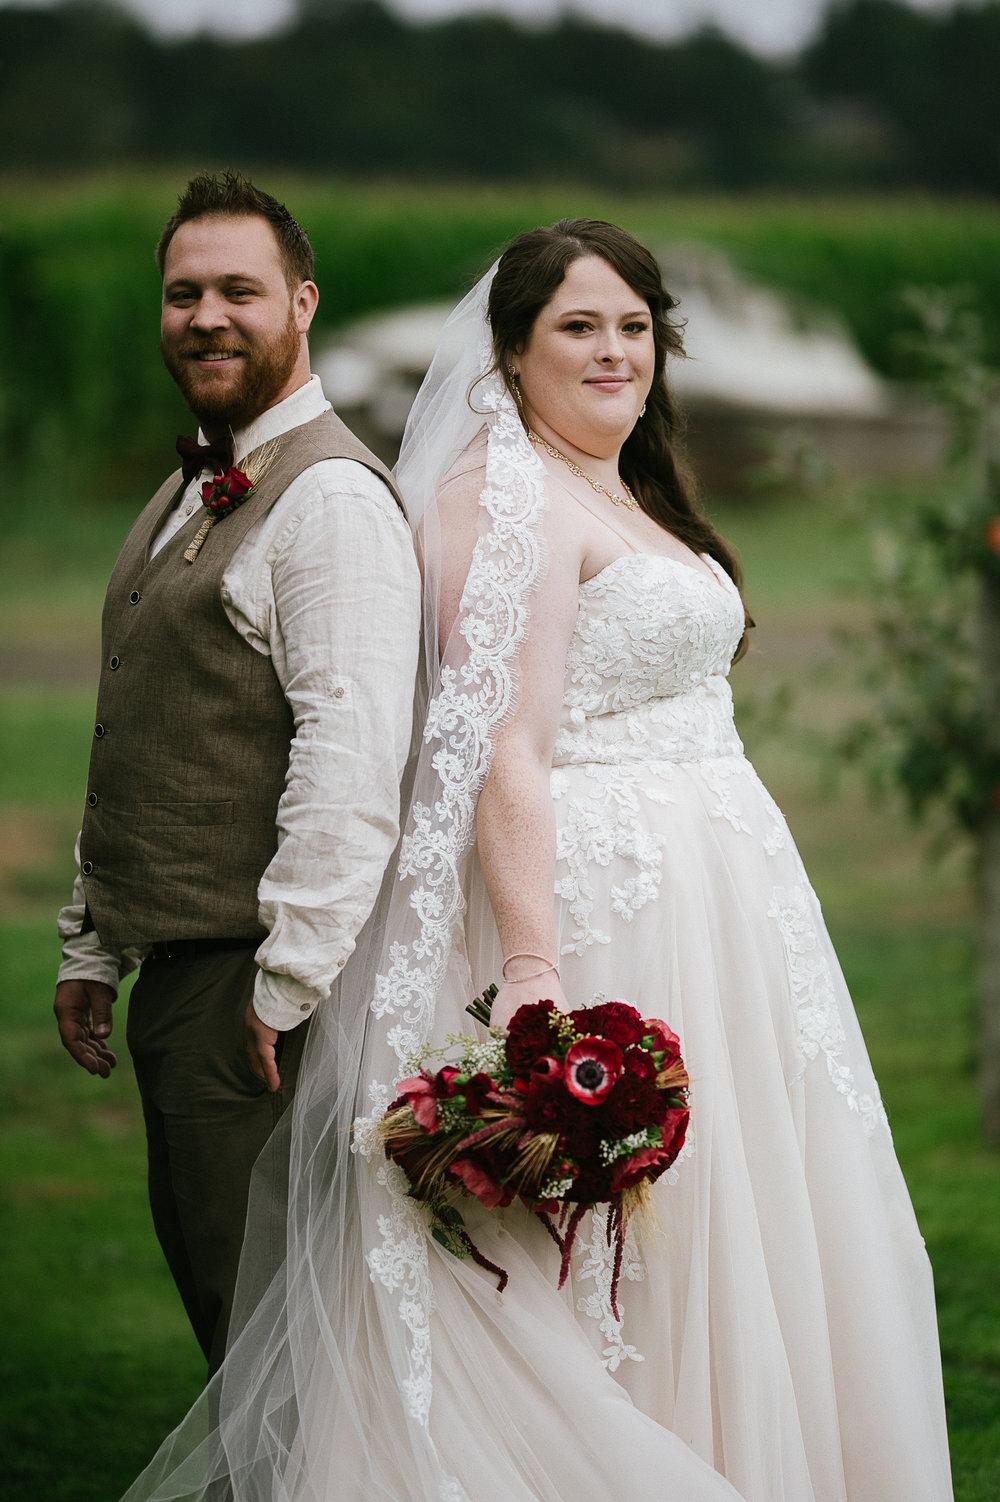 Swan Trail Farm Wedding_Sarah Schurman + Brian Skadan_Snohomish Wedding_Kelsey Lane Photography-5770.jpg